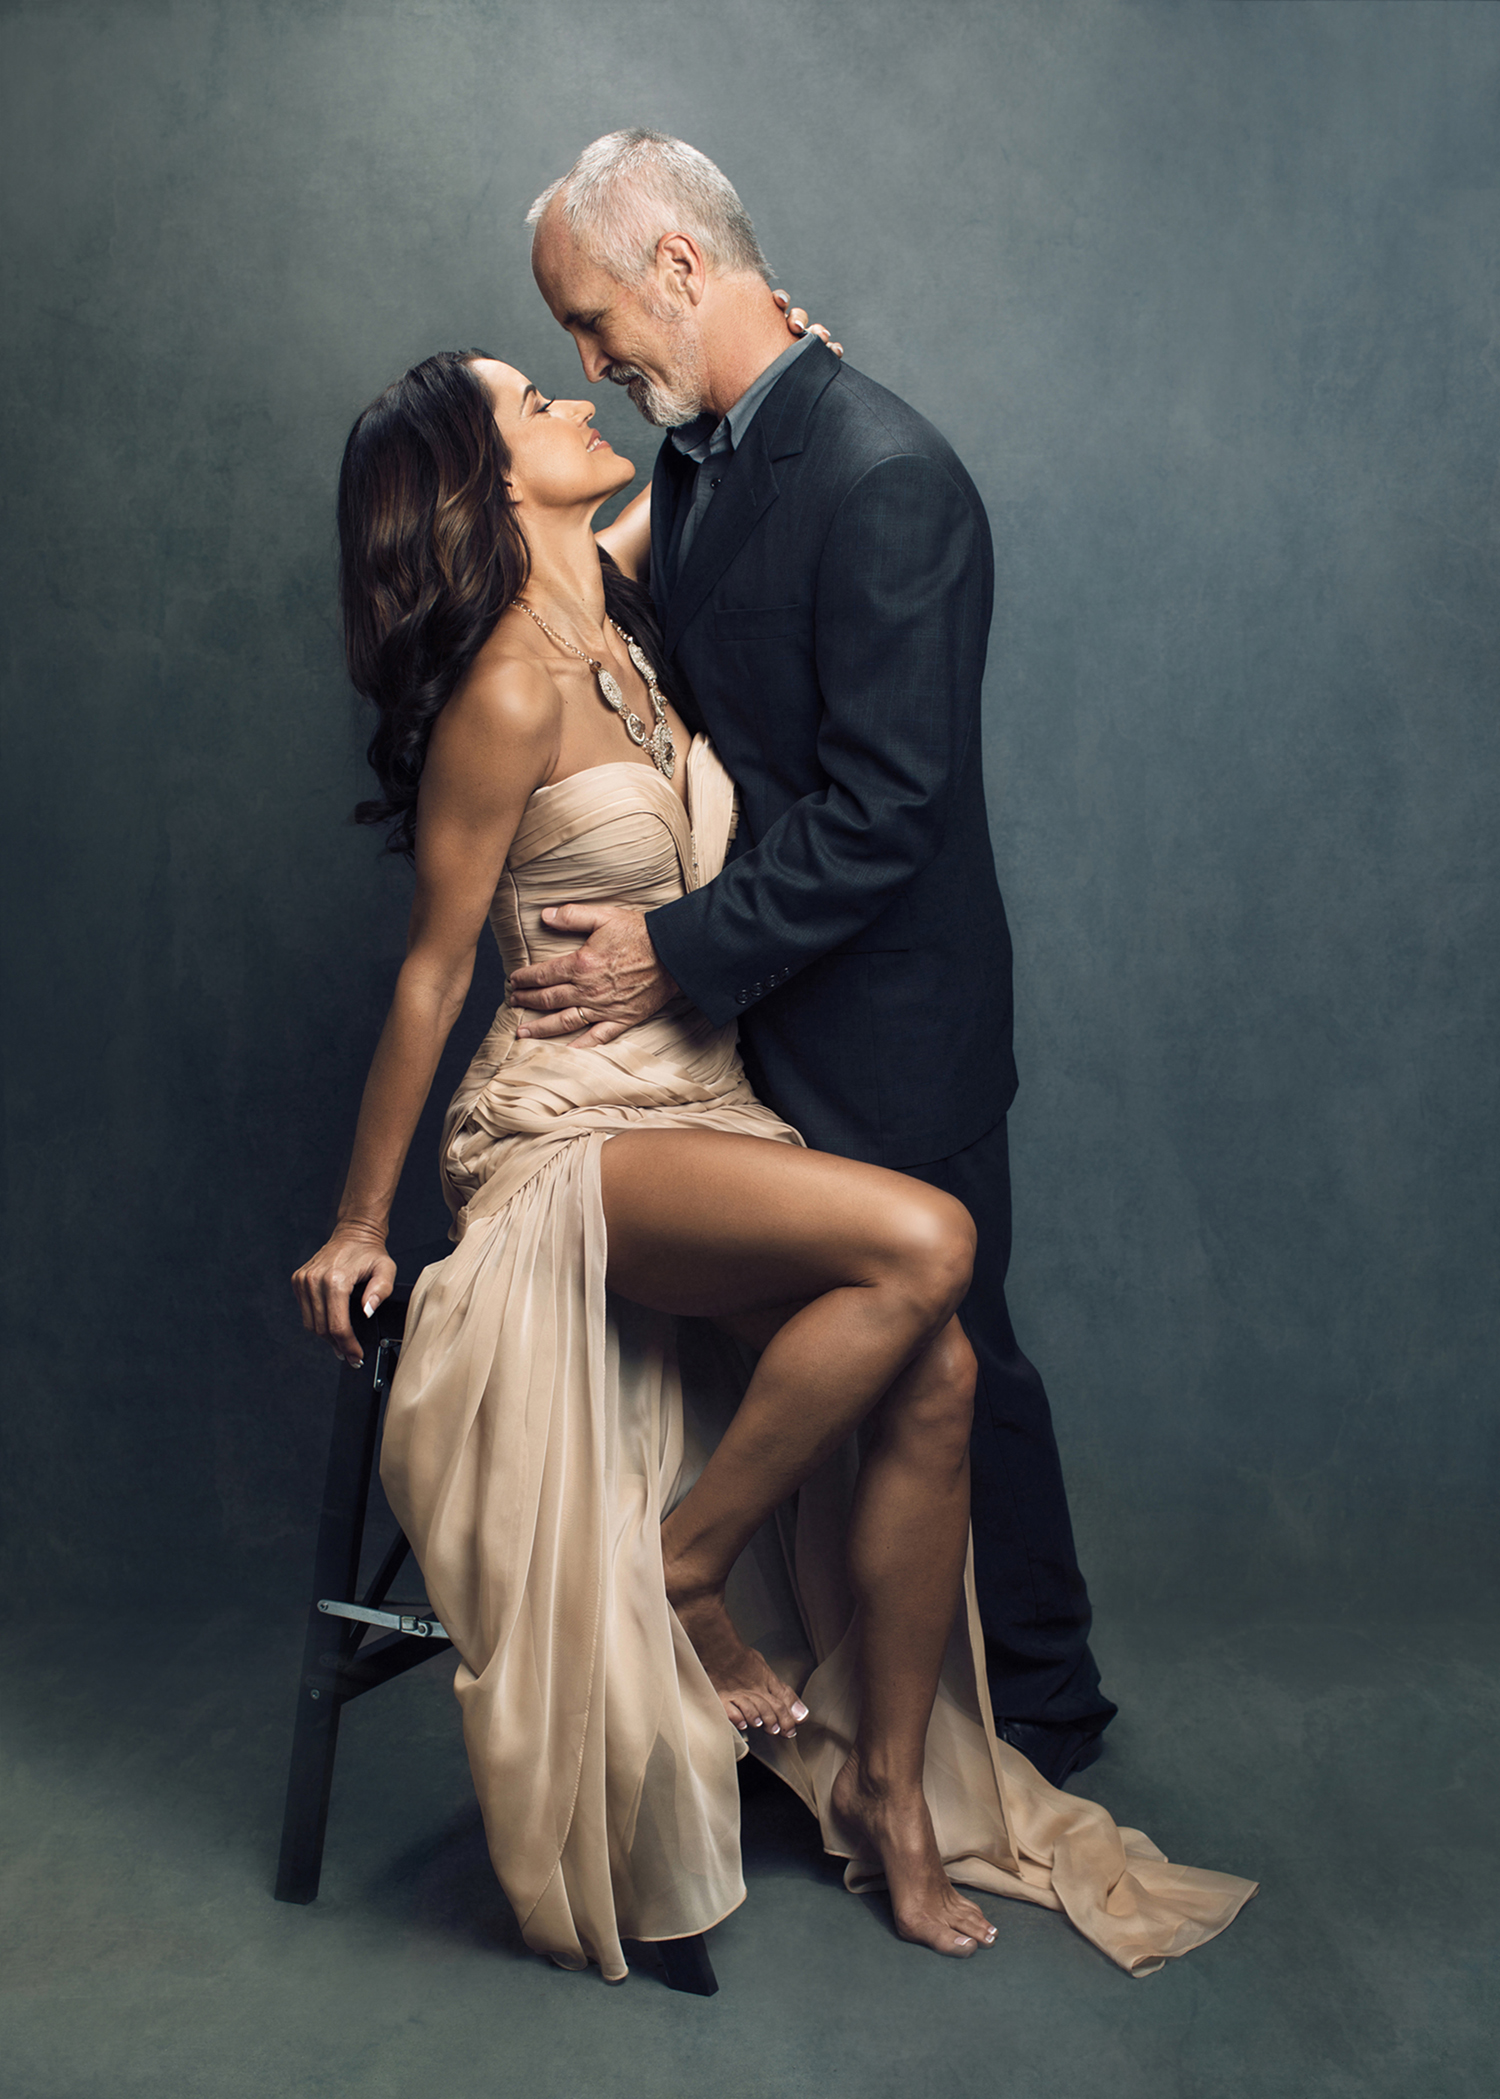 Hollywood style portrait of couple by Sacramento Photographer Mayumi Acosta.jpg